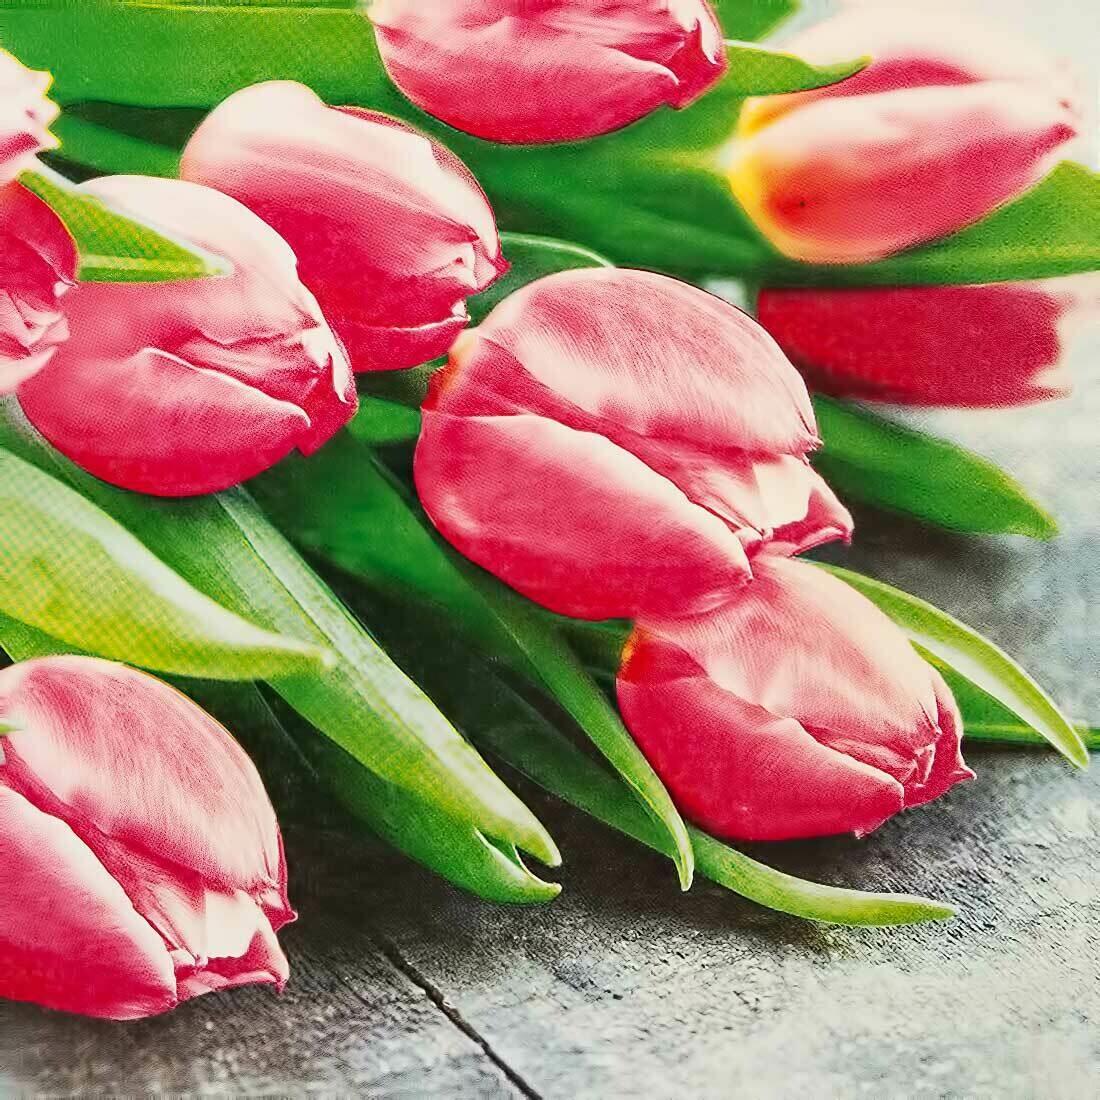 Decoupage Paper Napkins - Floral - Pink Tulips (1 Sheet)